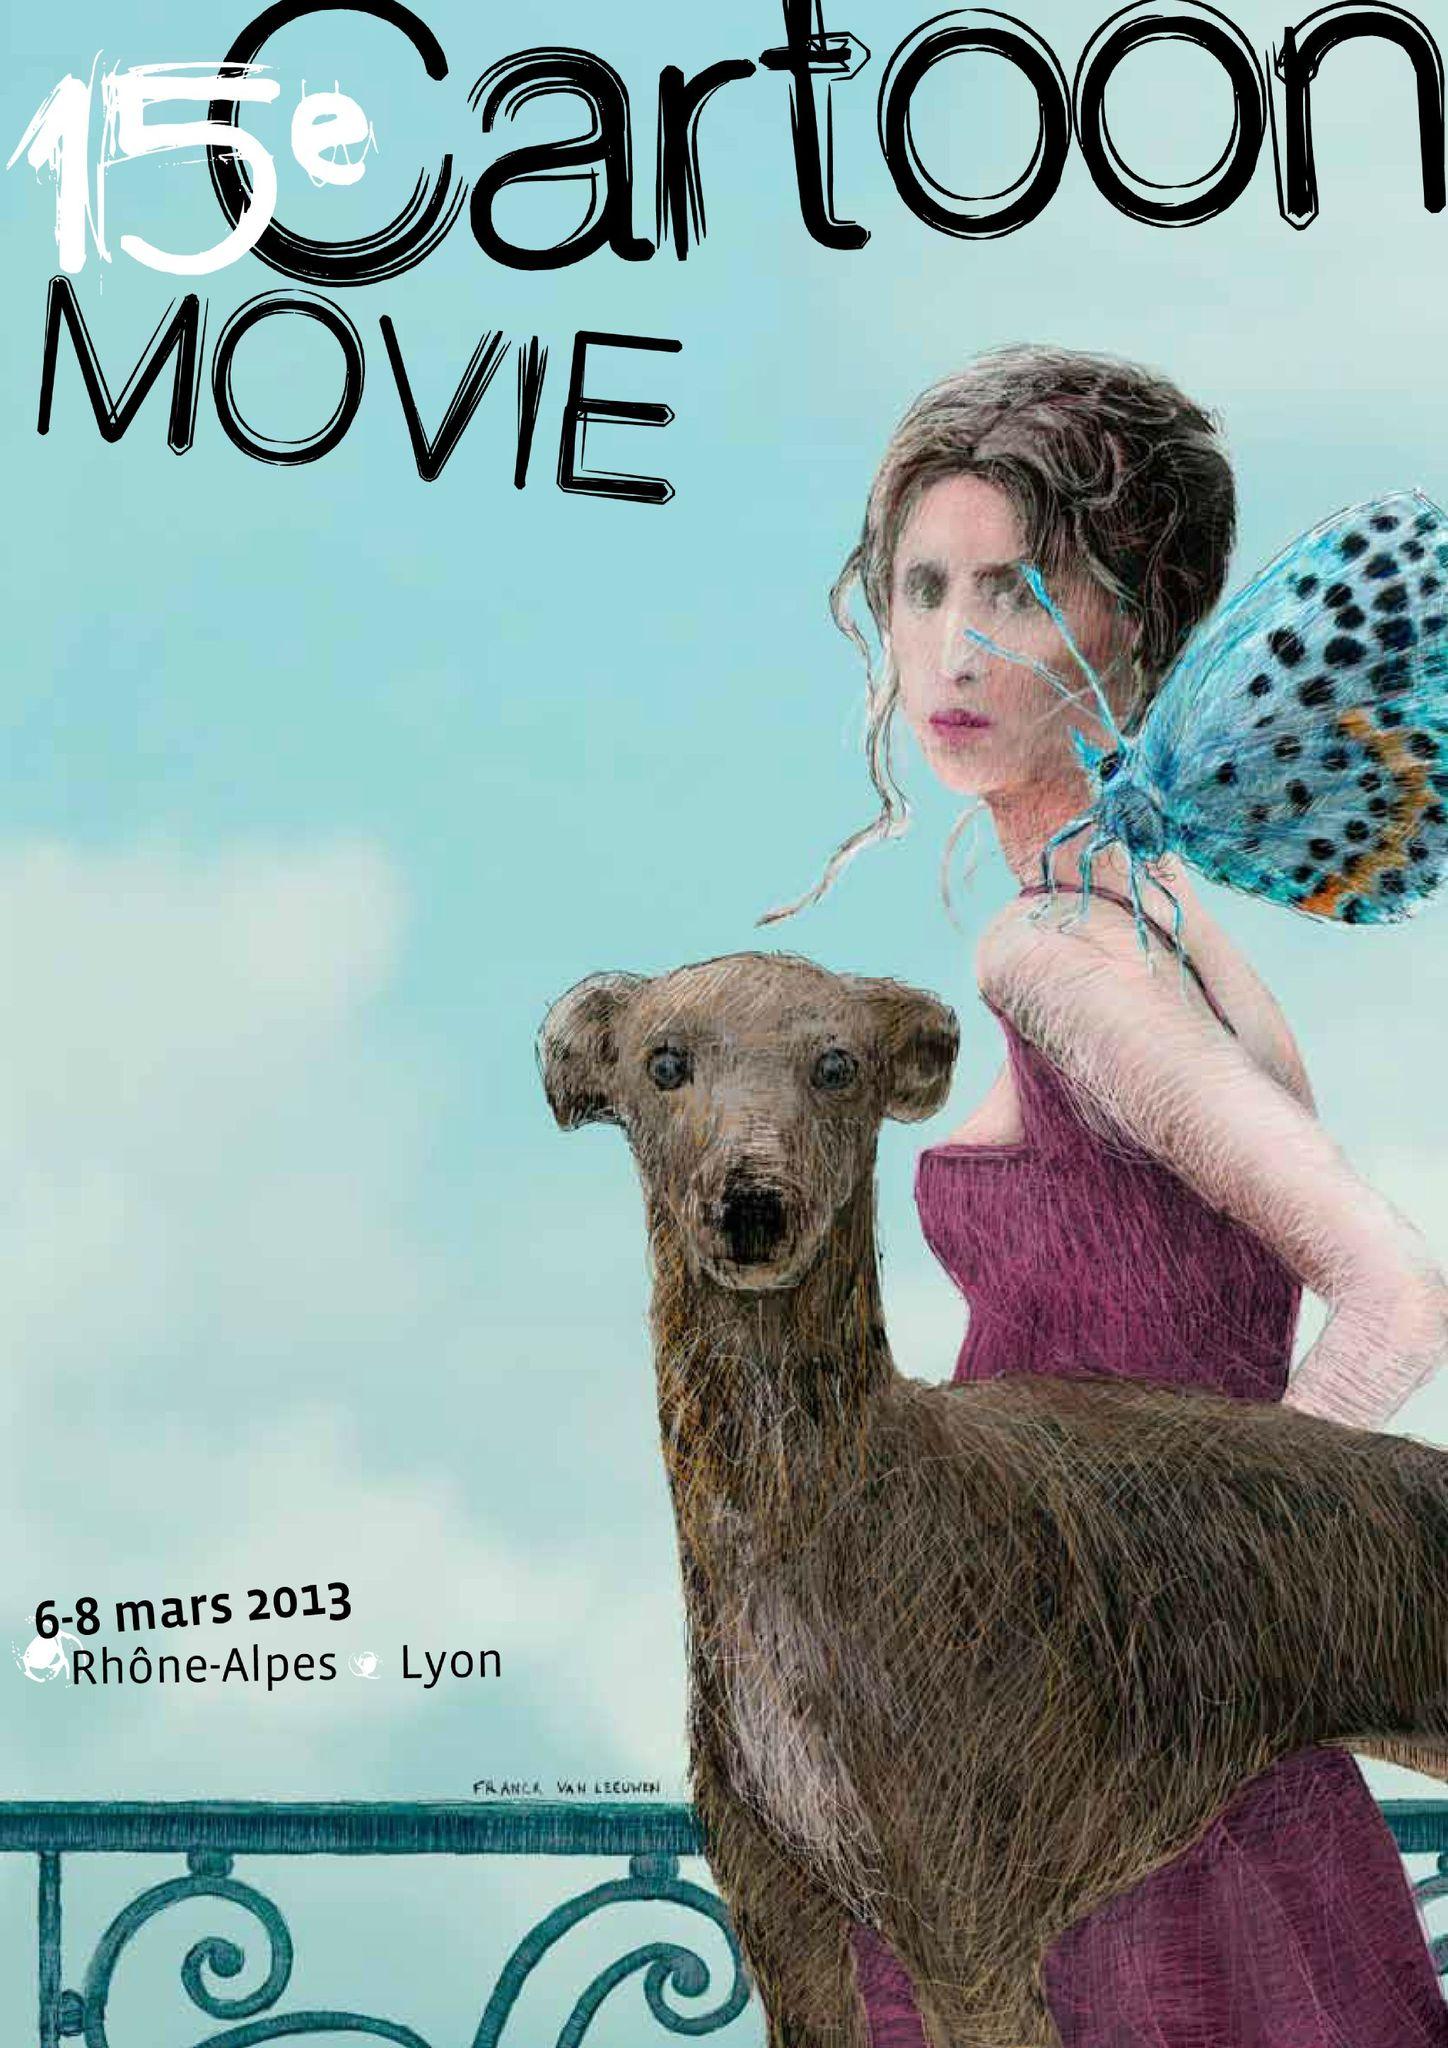 franck van leeuwen,cartoon movie 2013